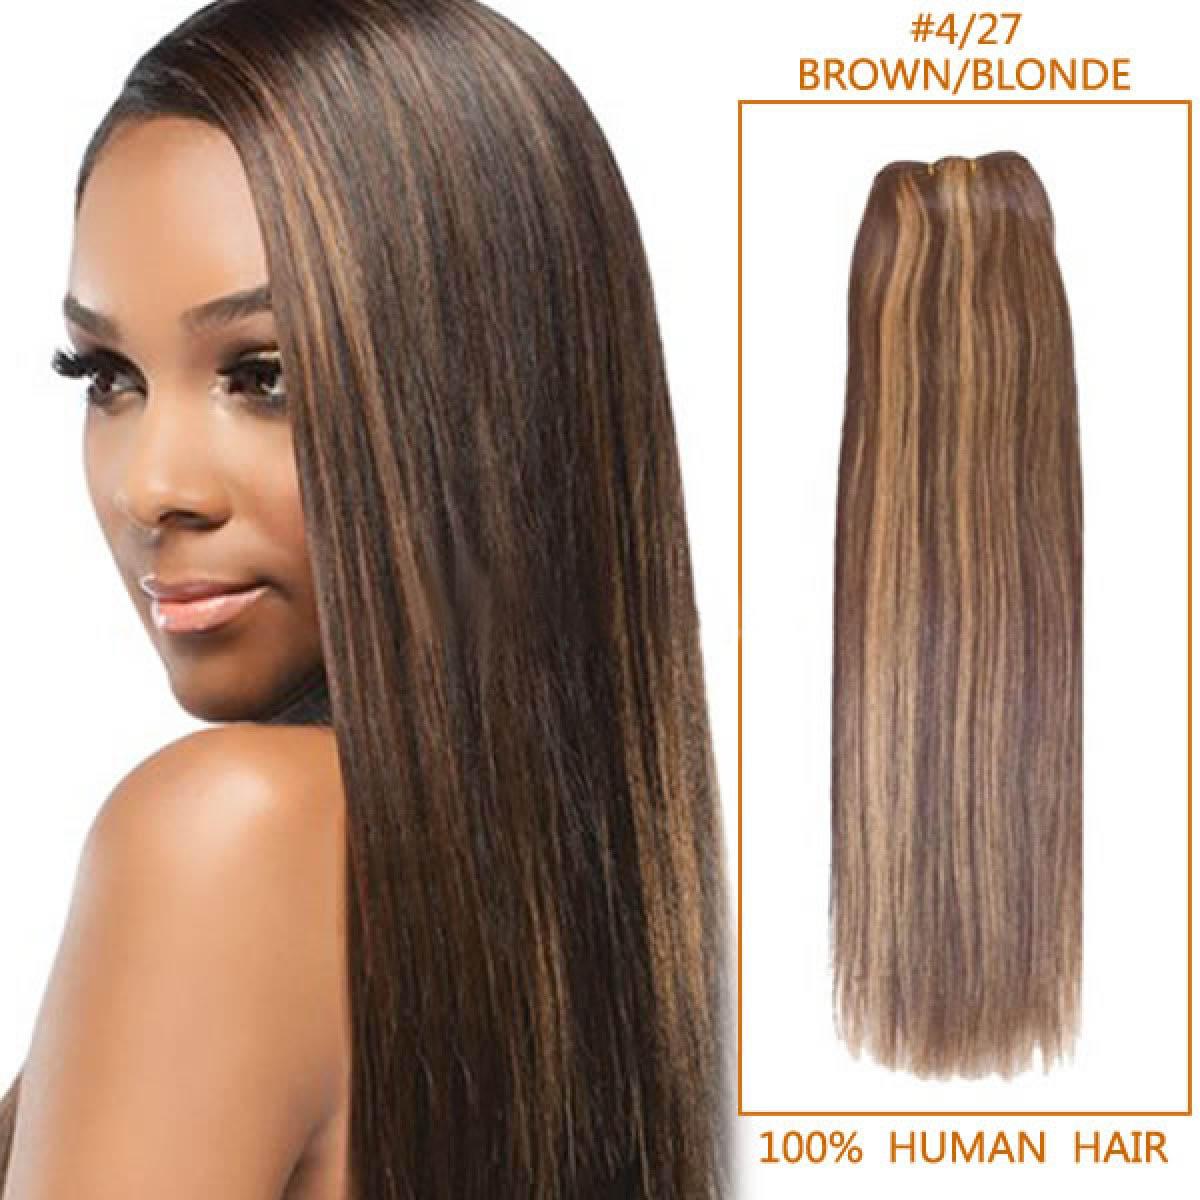 32 Inch 427 Brownblonde Straight Brazilian Virgin Hair Wefts